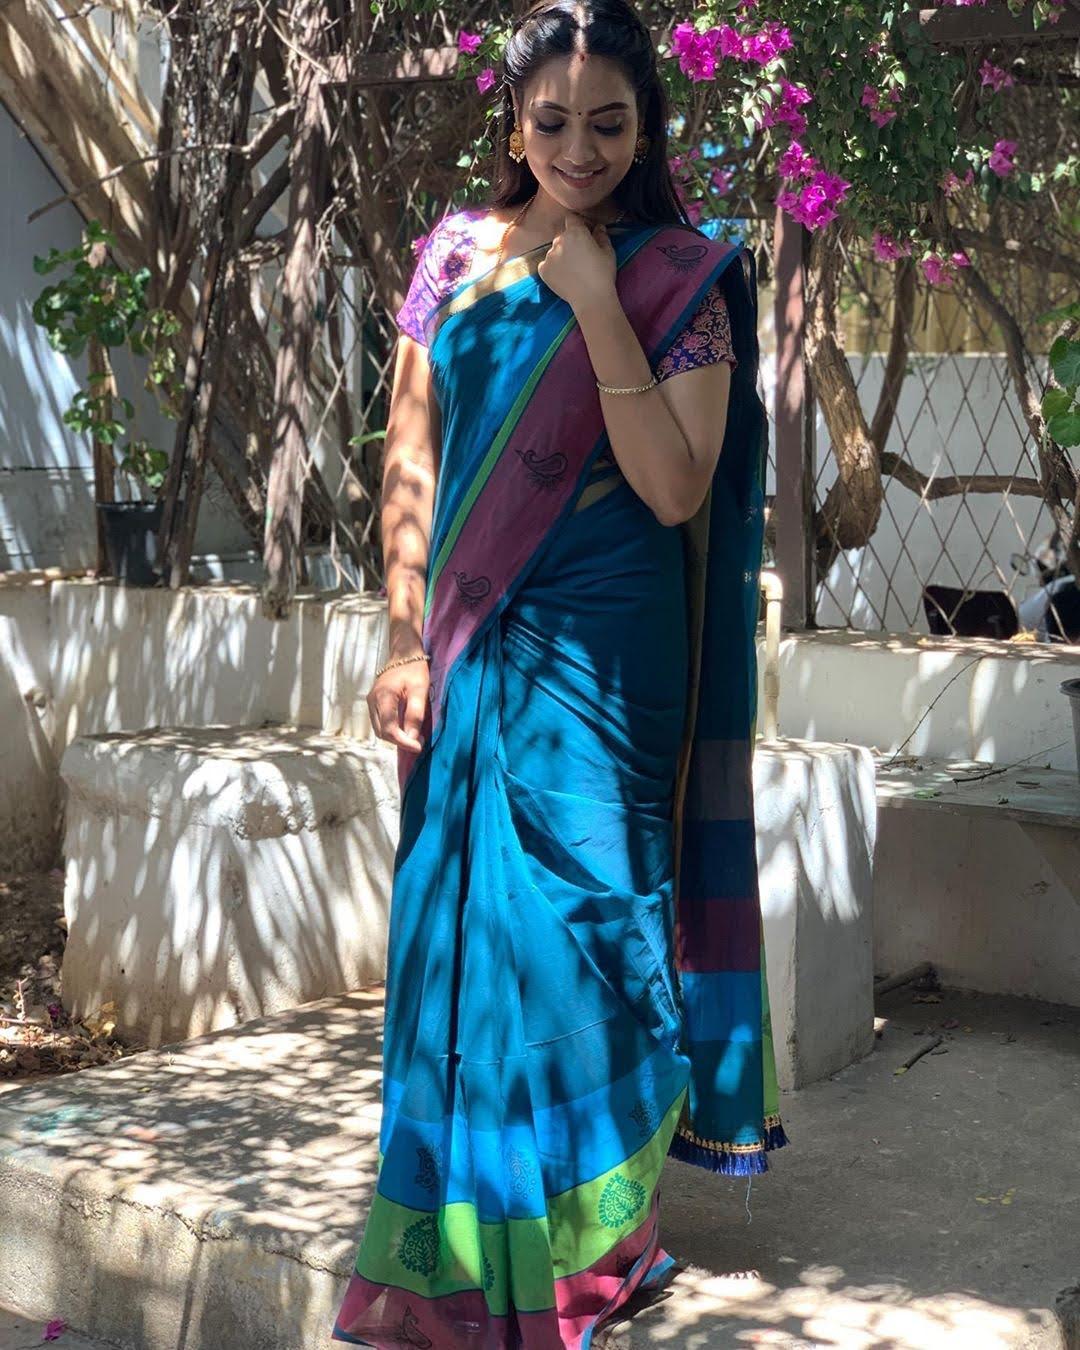 pavithra-janani-64743